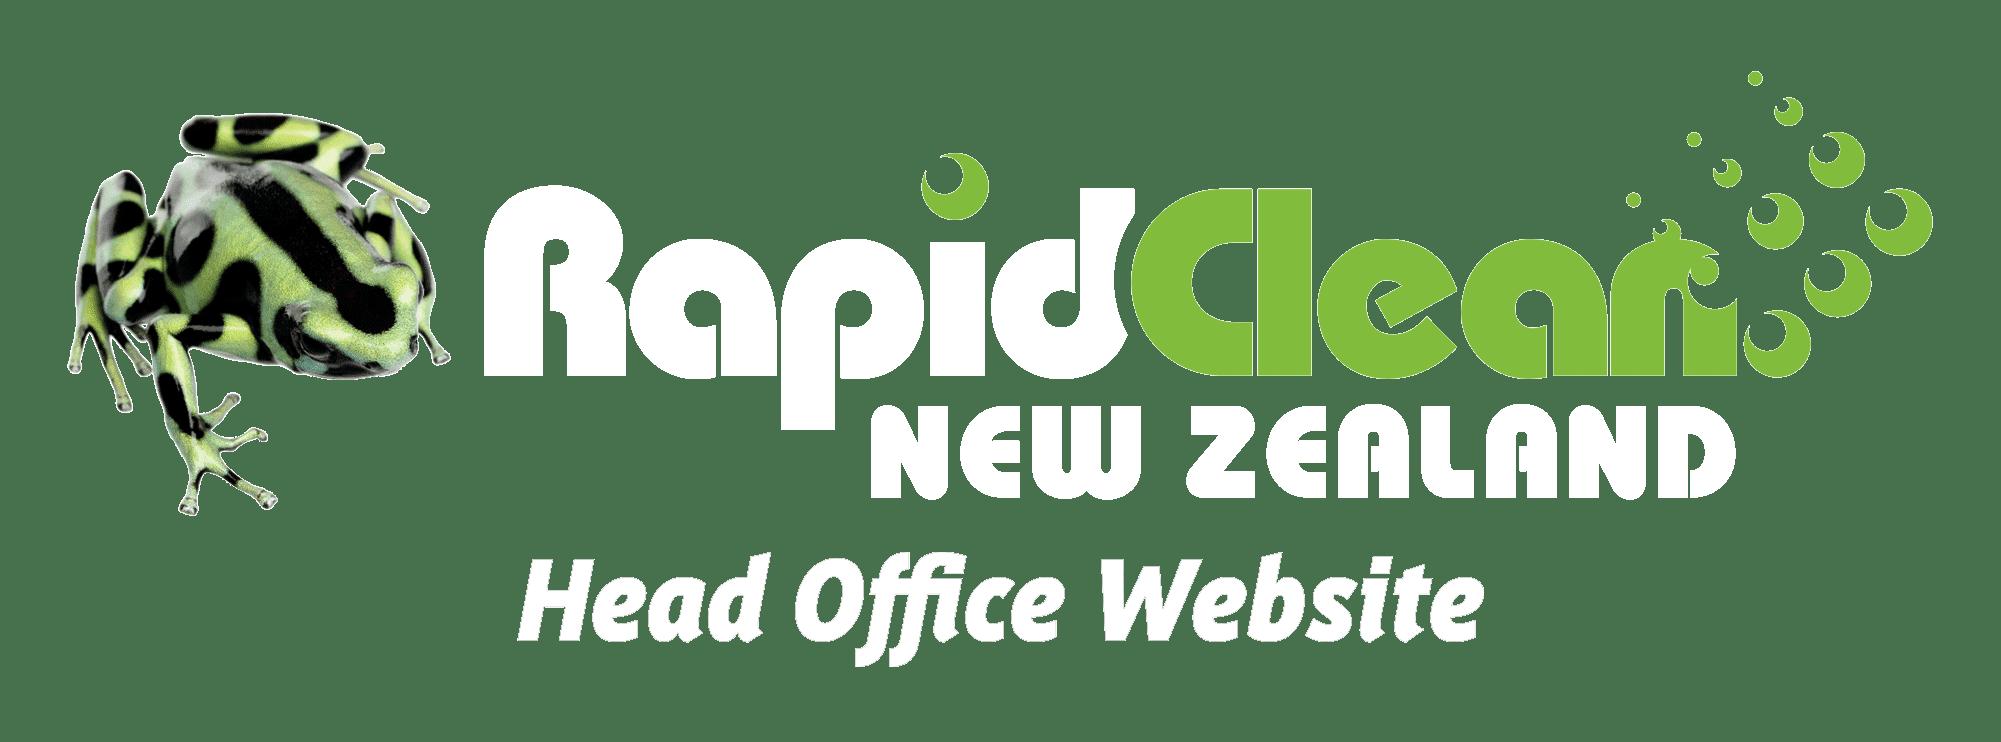 RapidClean NZ